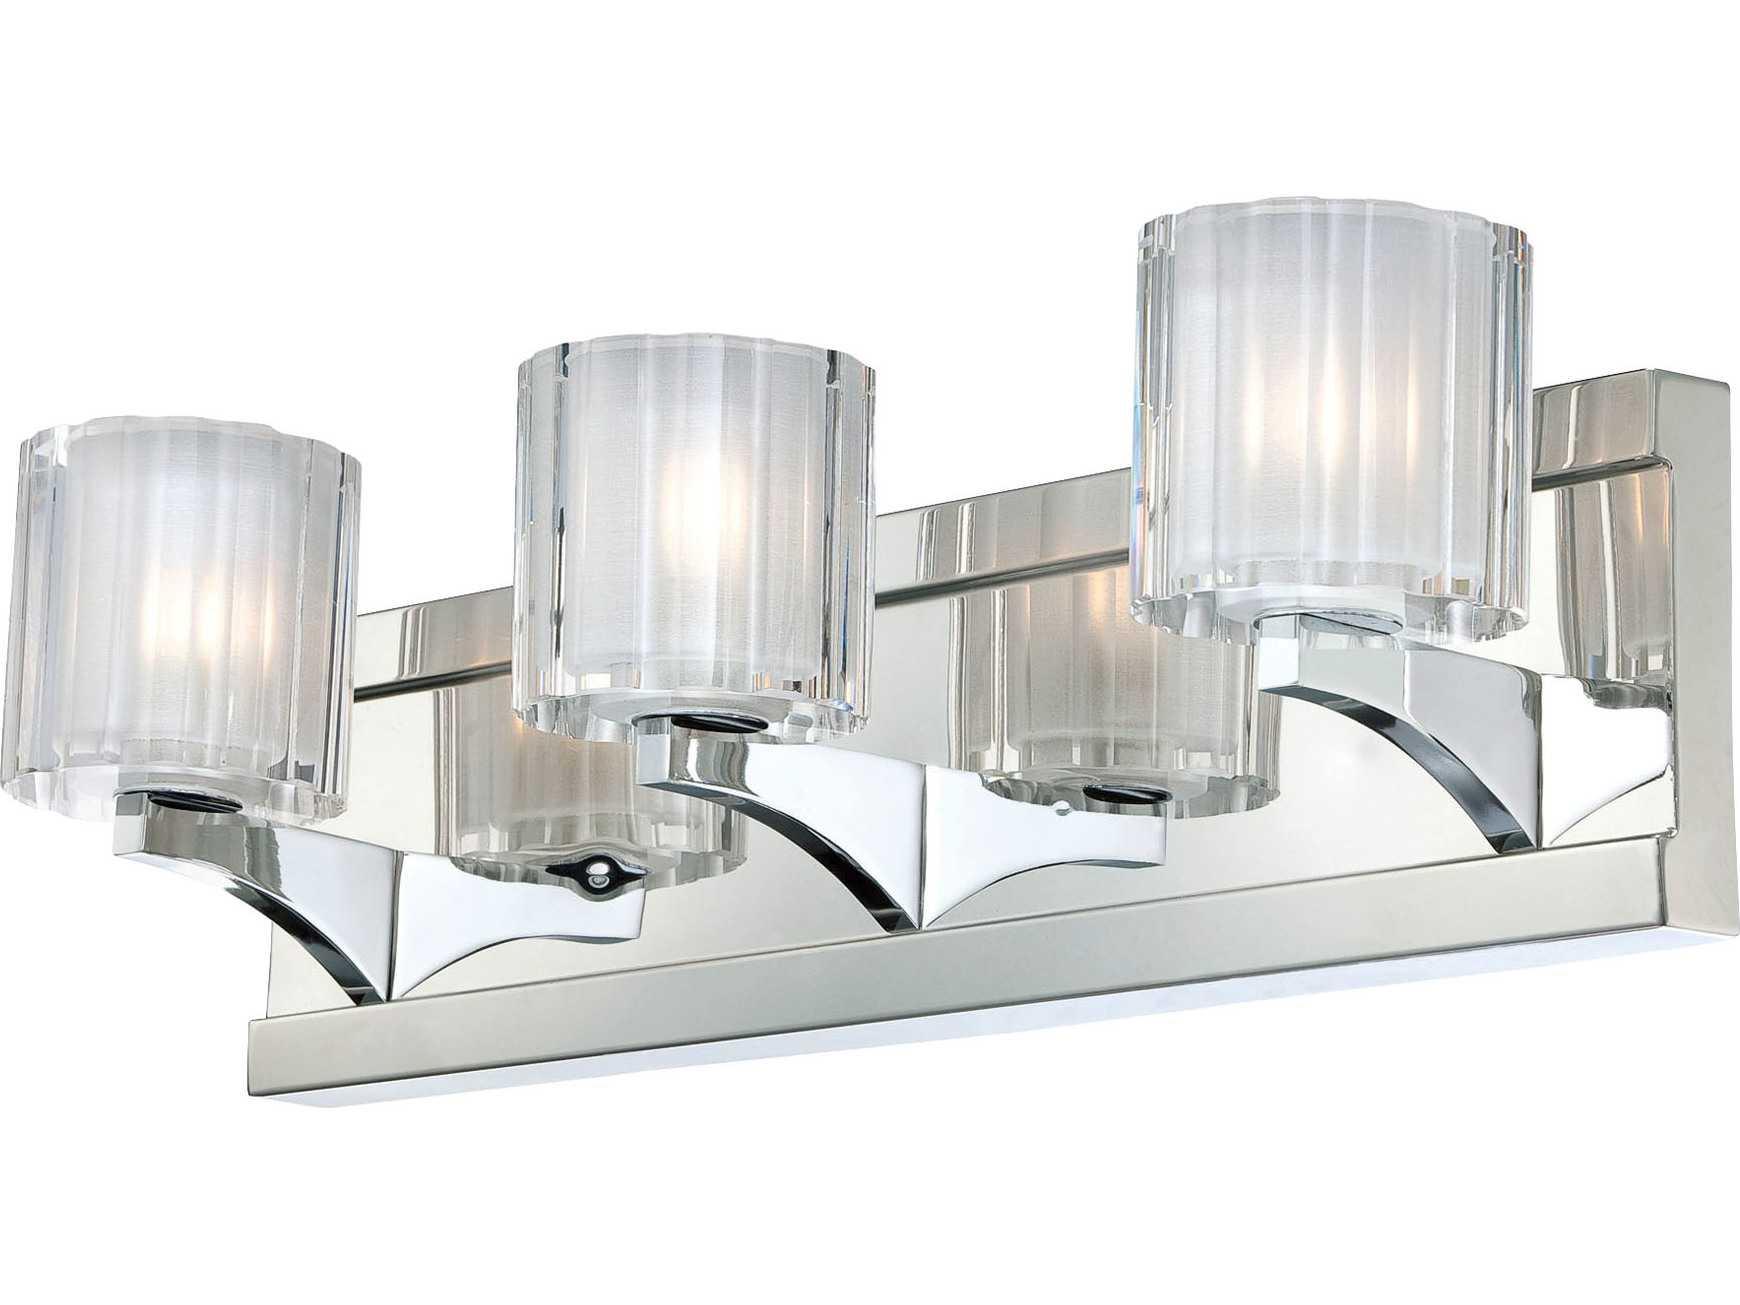 Chrome Crystal Vanity Lights : Alico Tiara Chrome & Crystal Glass Three-Light Vanity Light BV3003-0-15